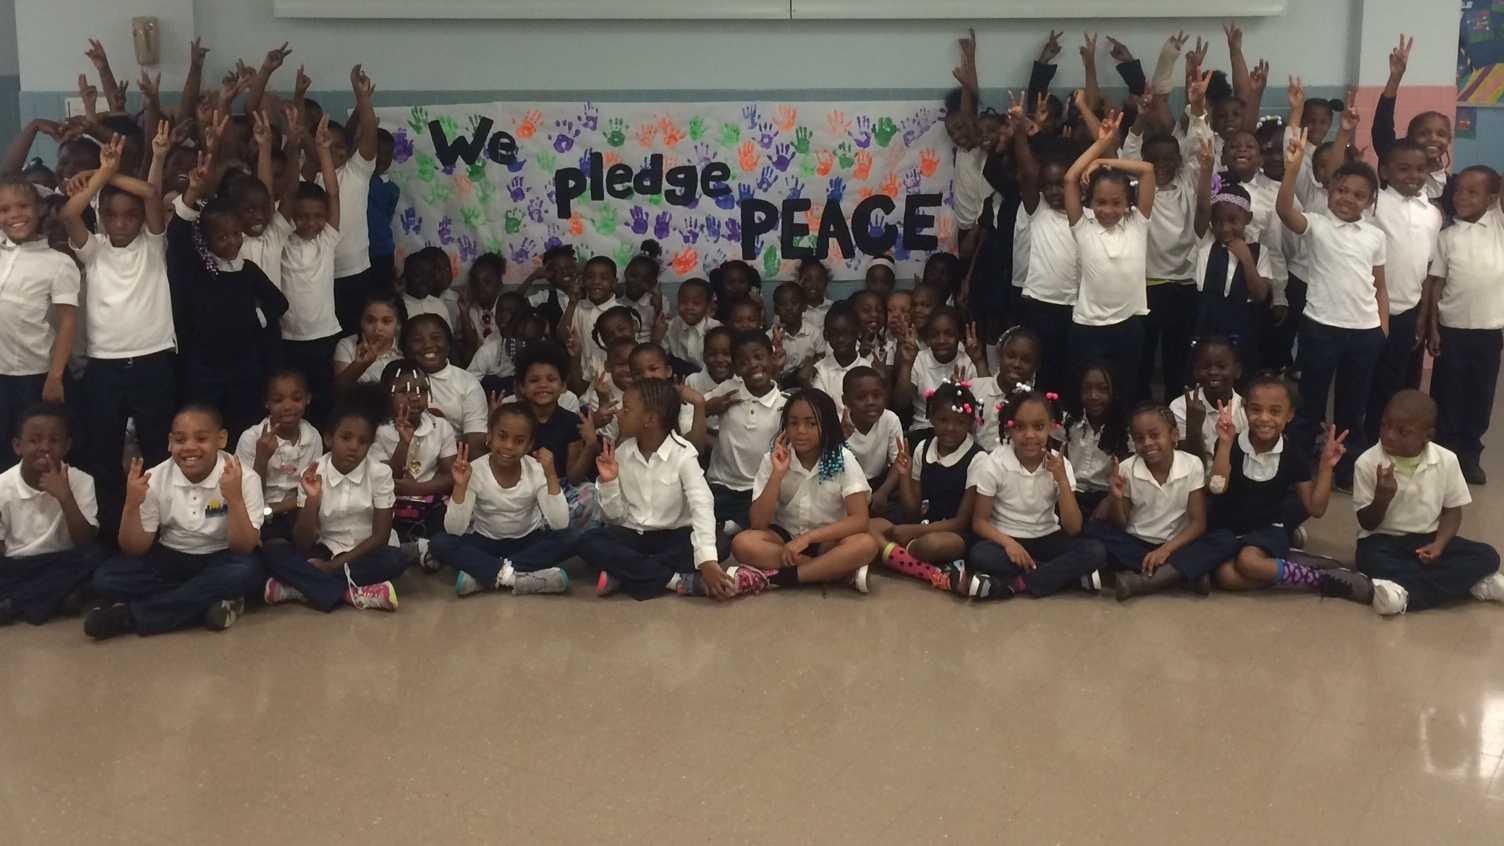 Collington Square Elementary School students